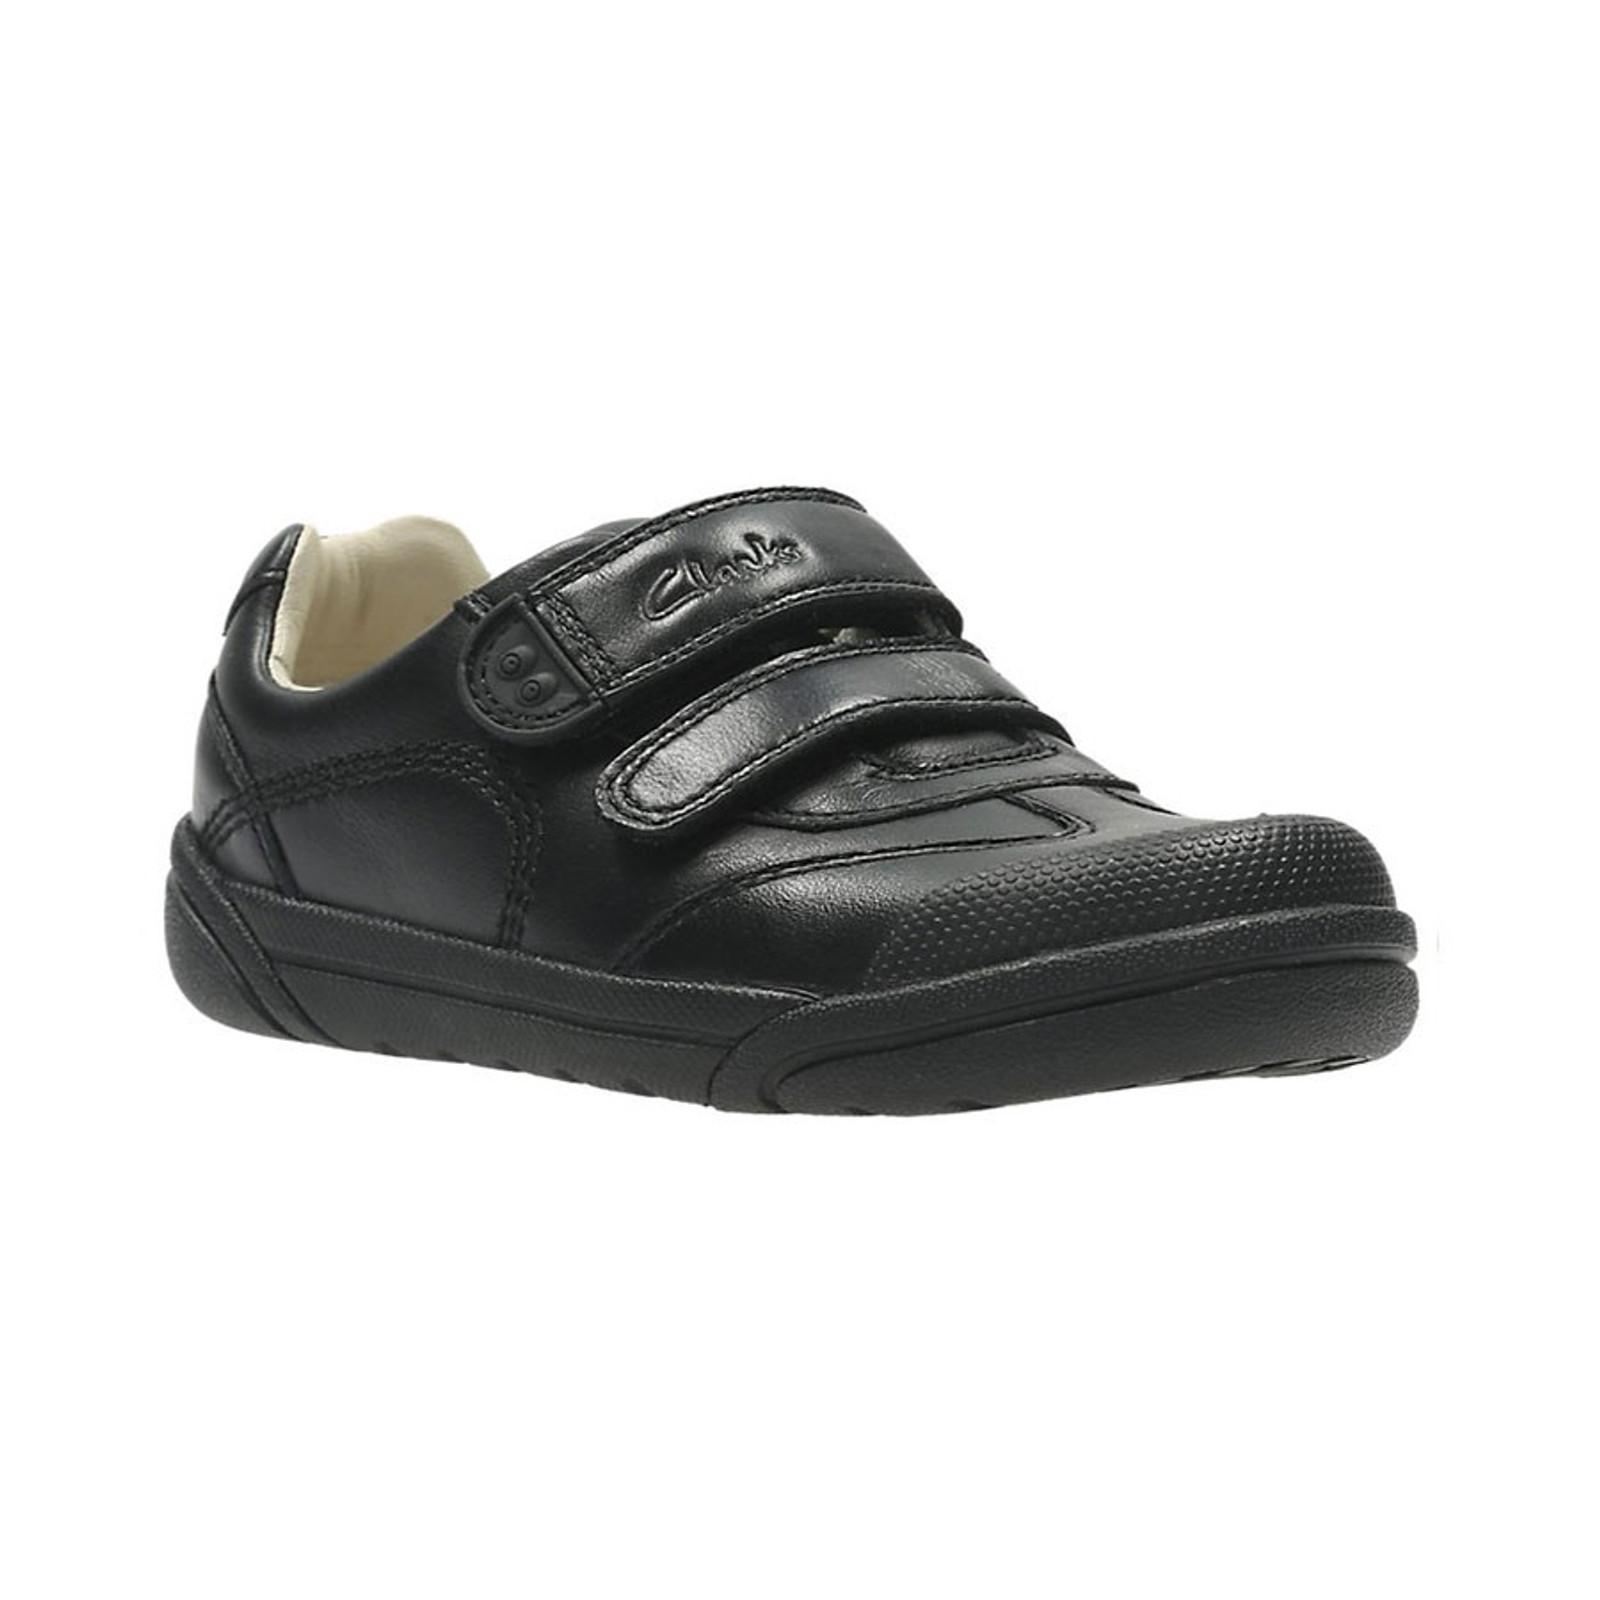 Clarks Boys LILFOLK ZOO INFANT Black Leather